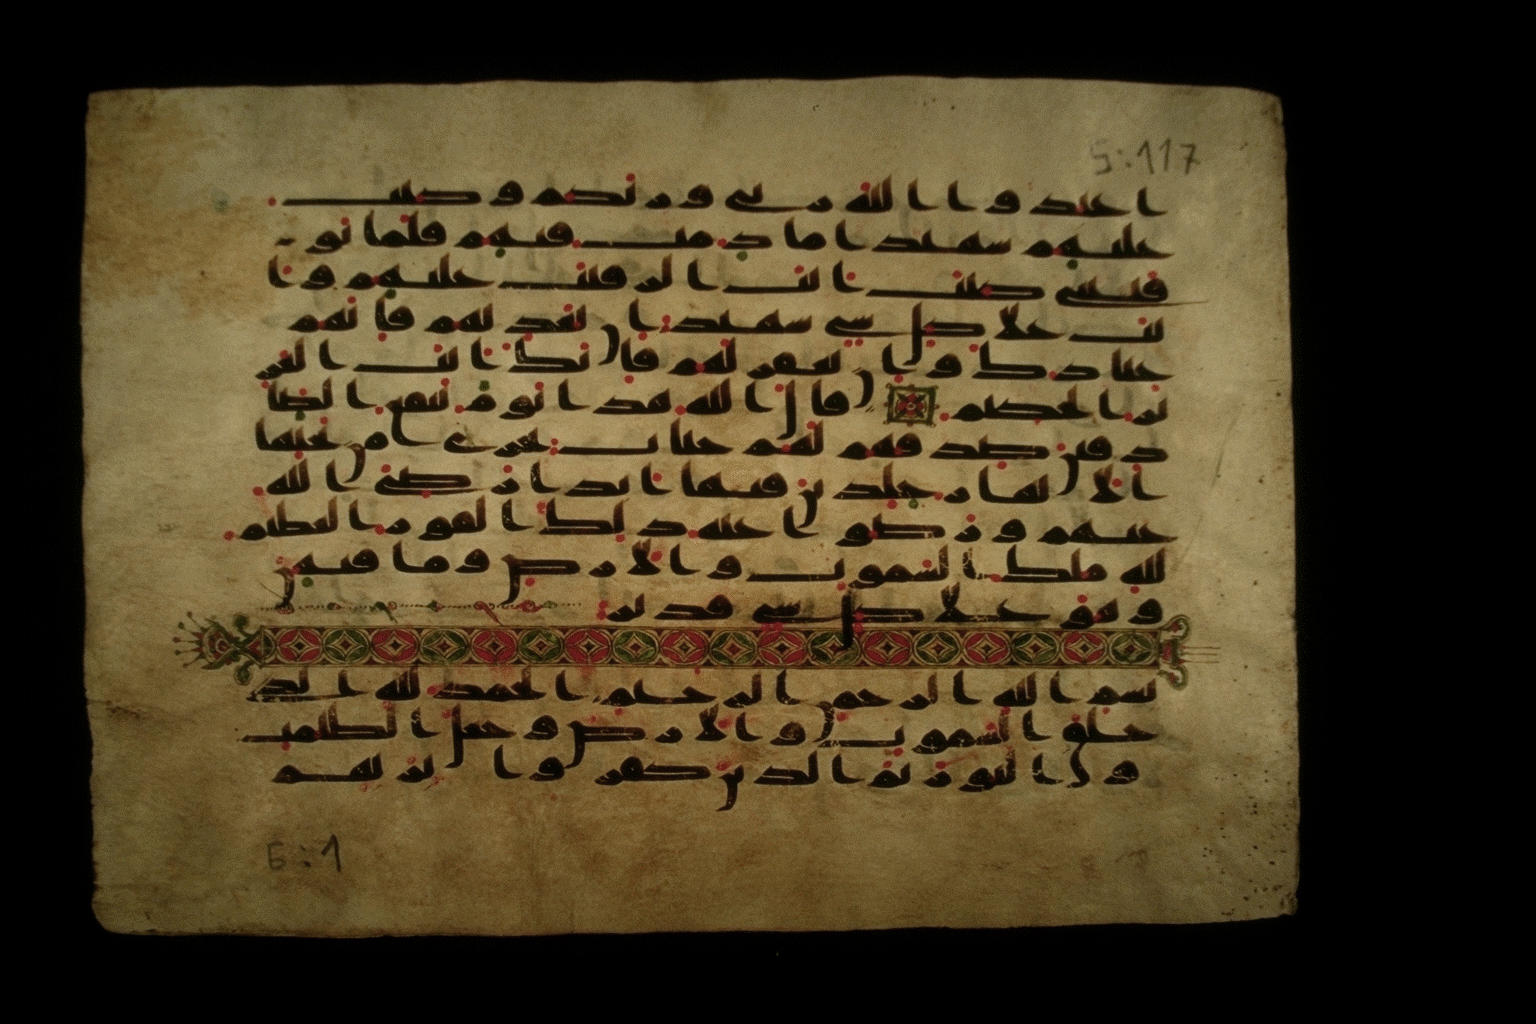 تحميل كتاب مخطوطات مدفونة pdf